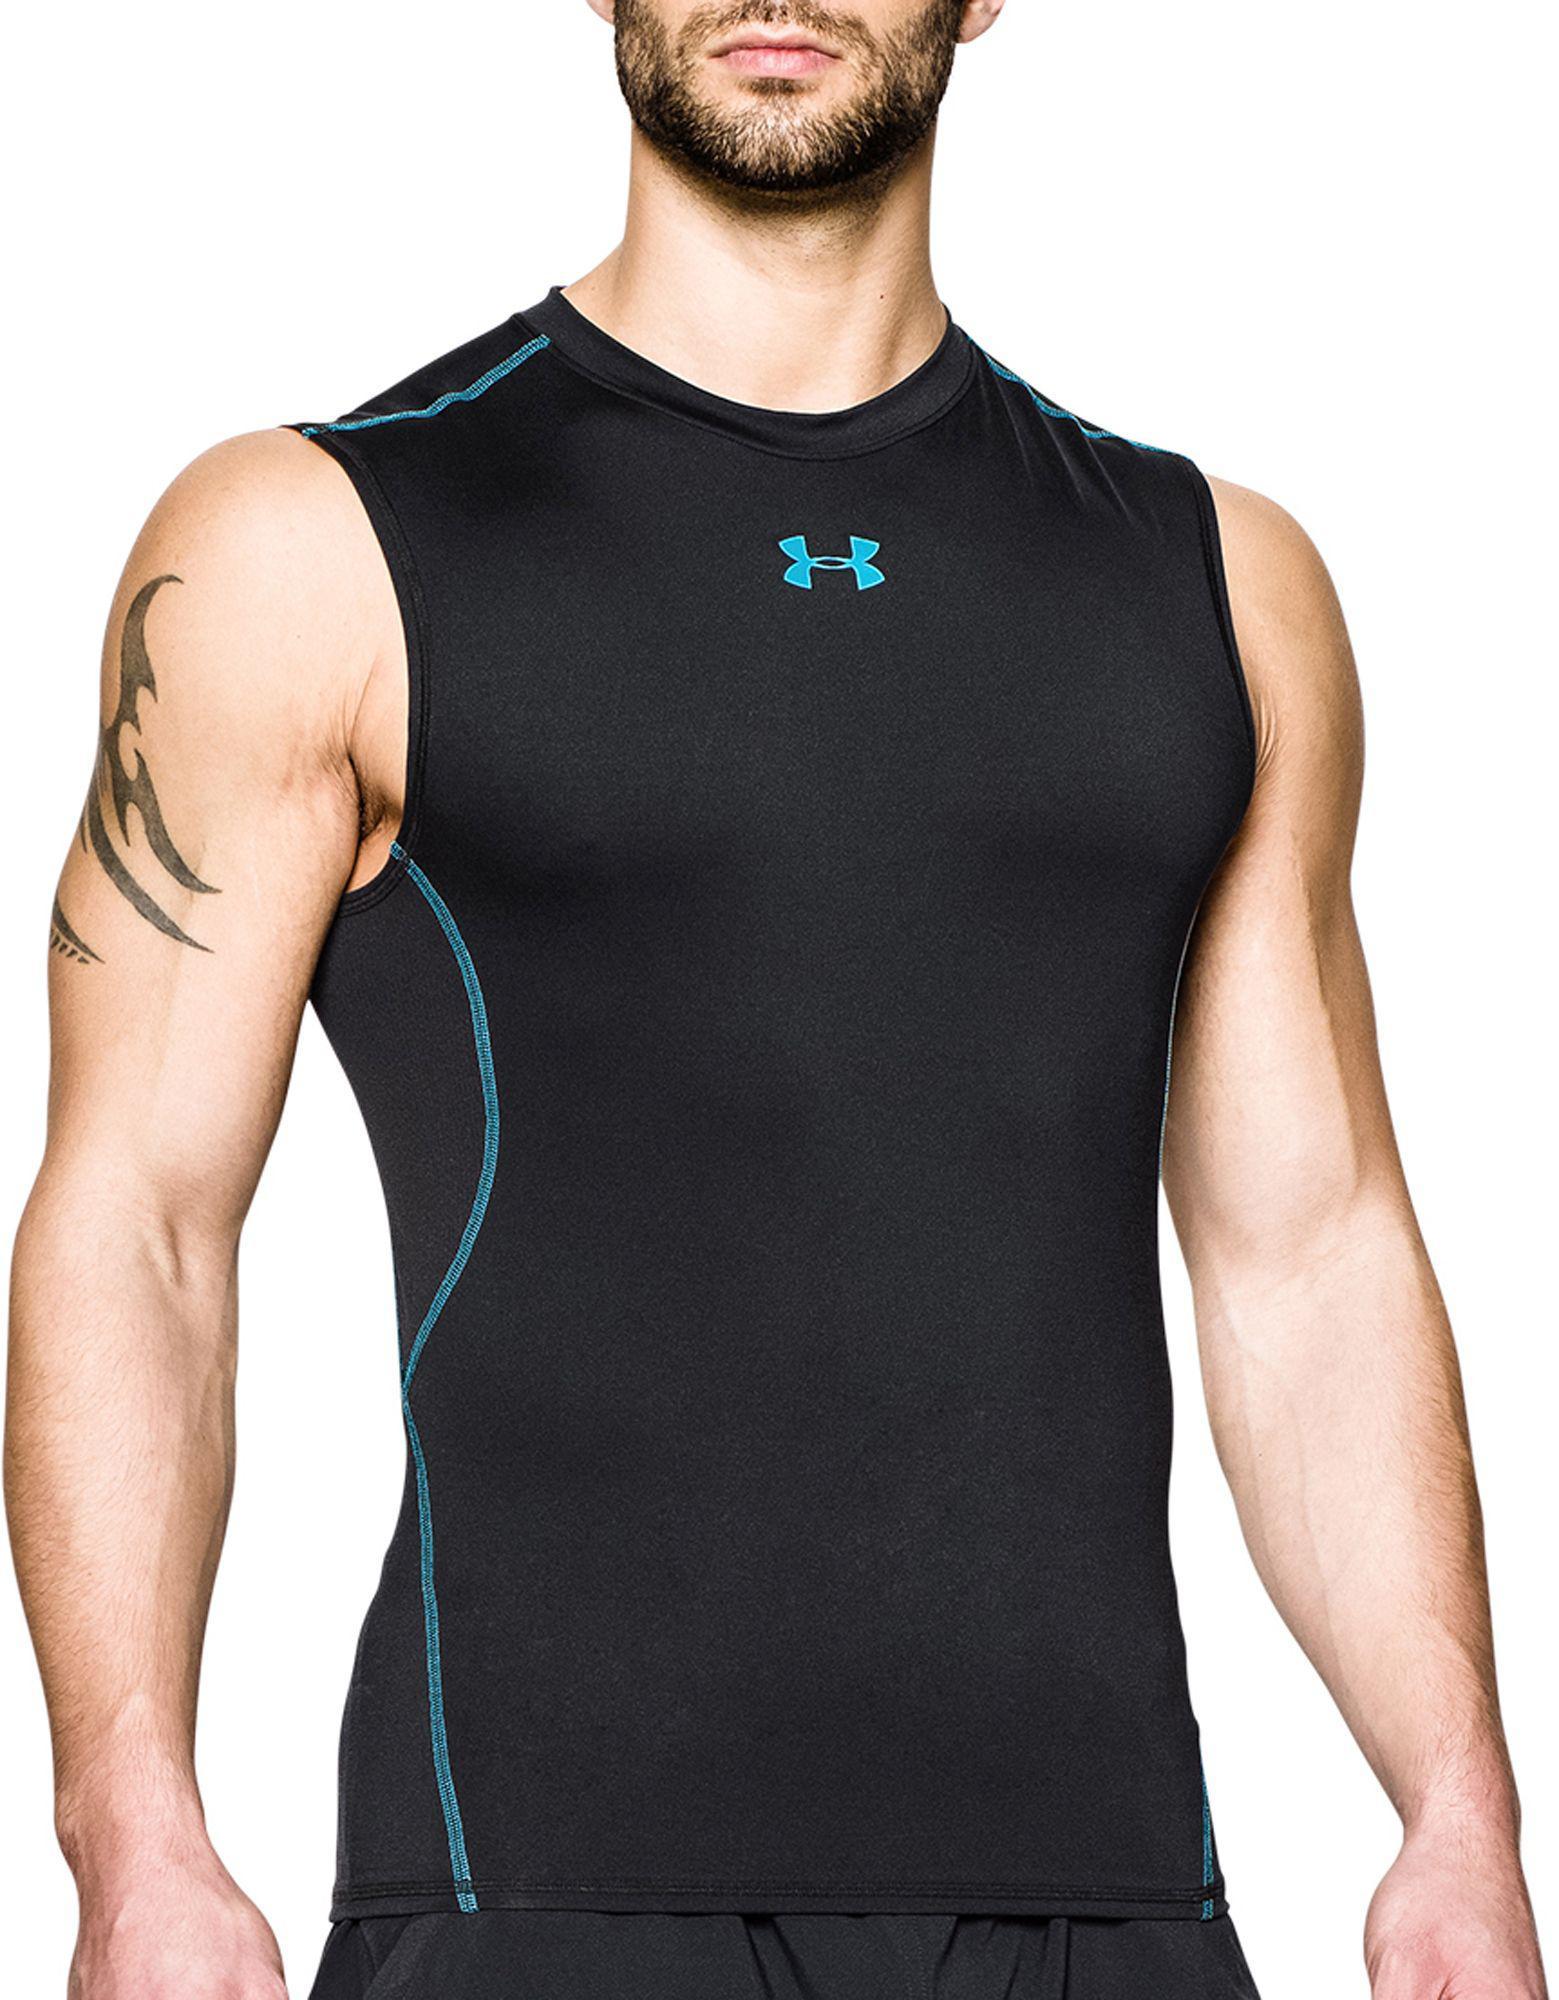 a671b59b Under Armour Heatgear Armour Sleeveless Shirt in Black for Men - Lyst